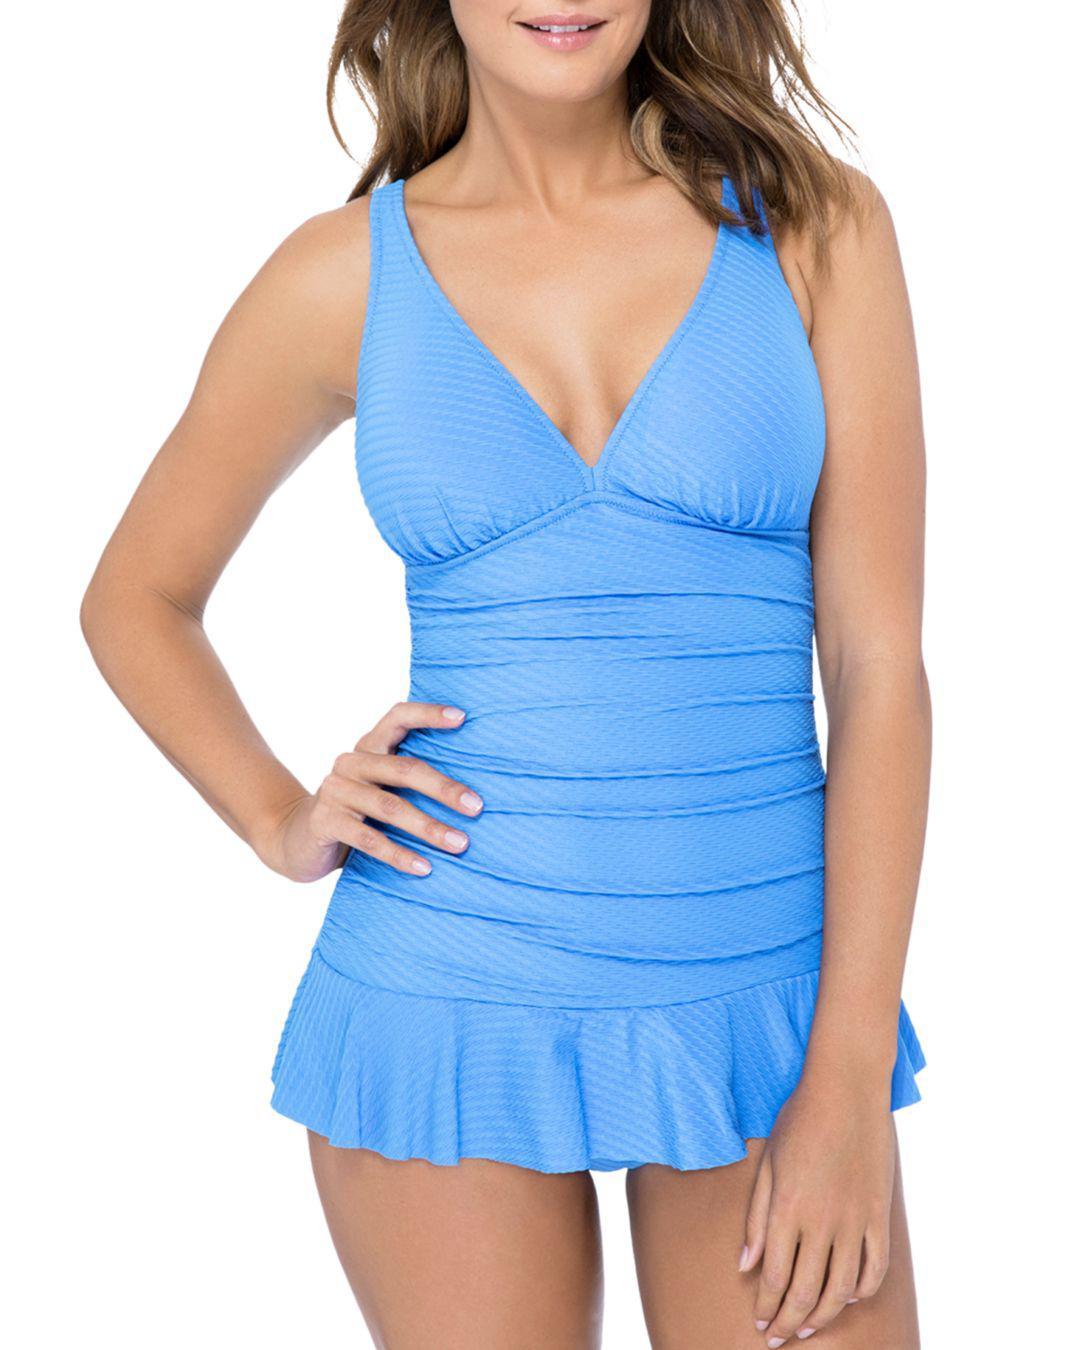 694083f0ae4a1 Lyst - Gottex Ribbons D-cup Swim Dress in Blue